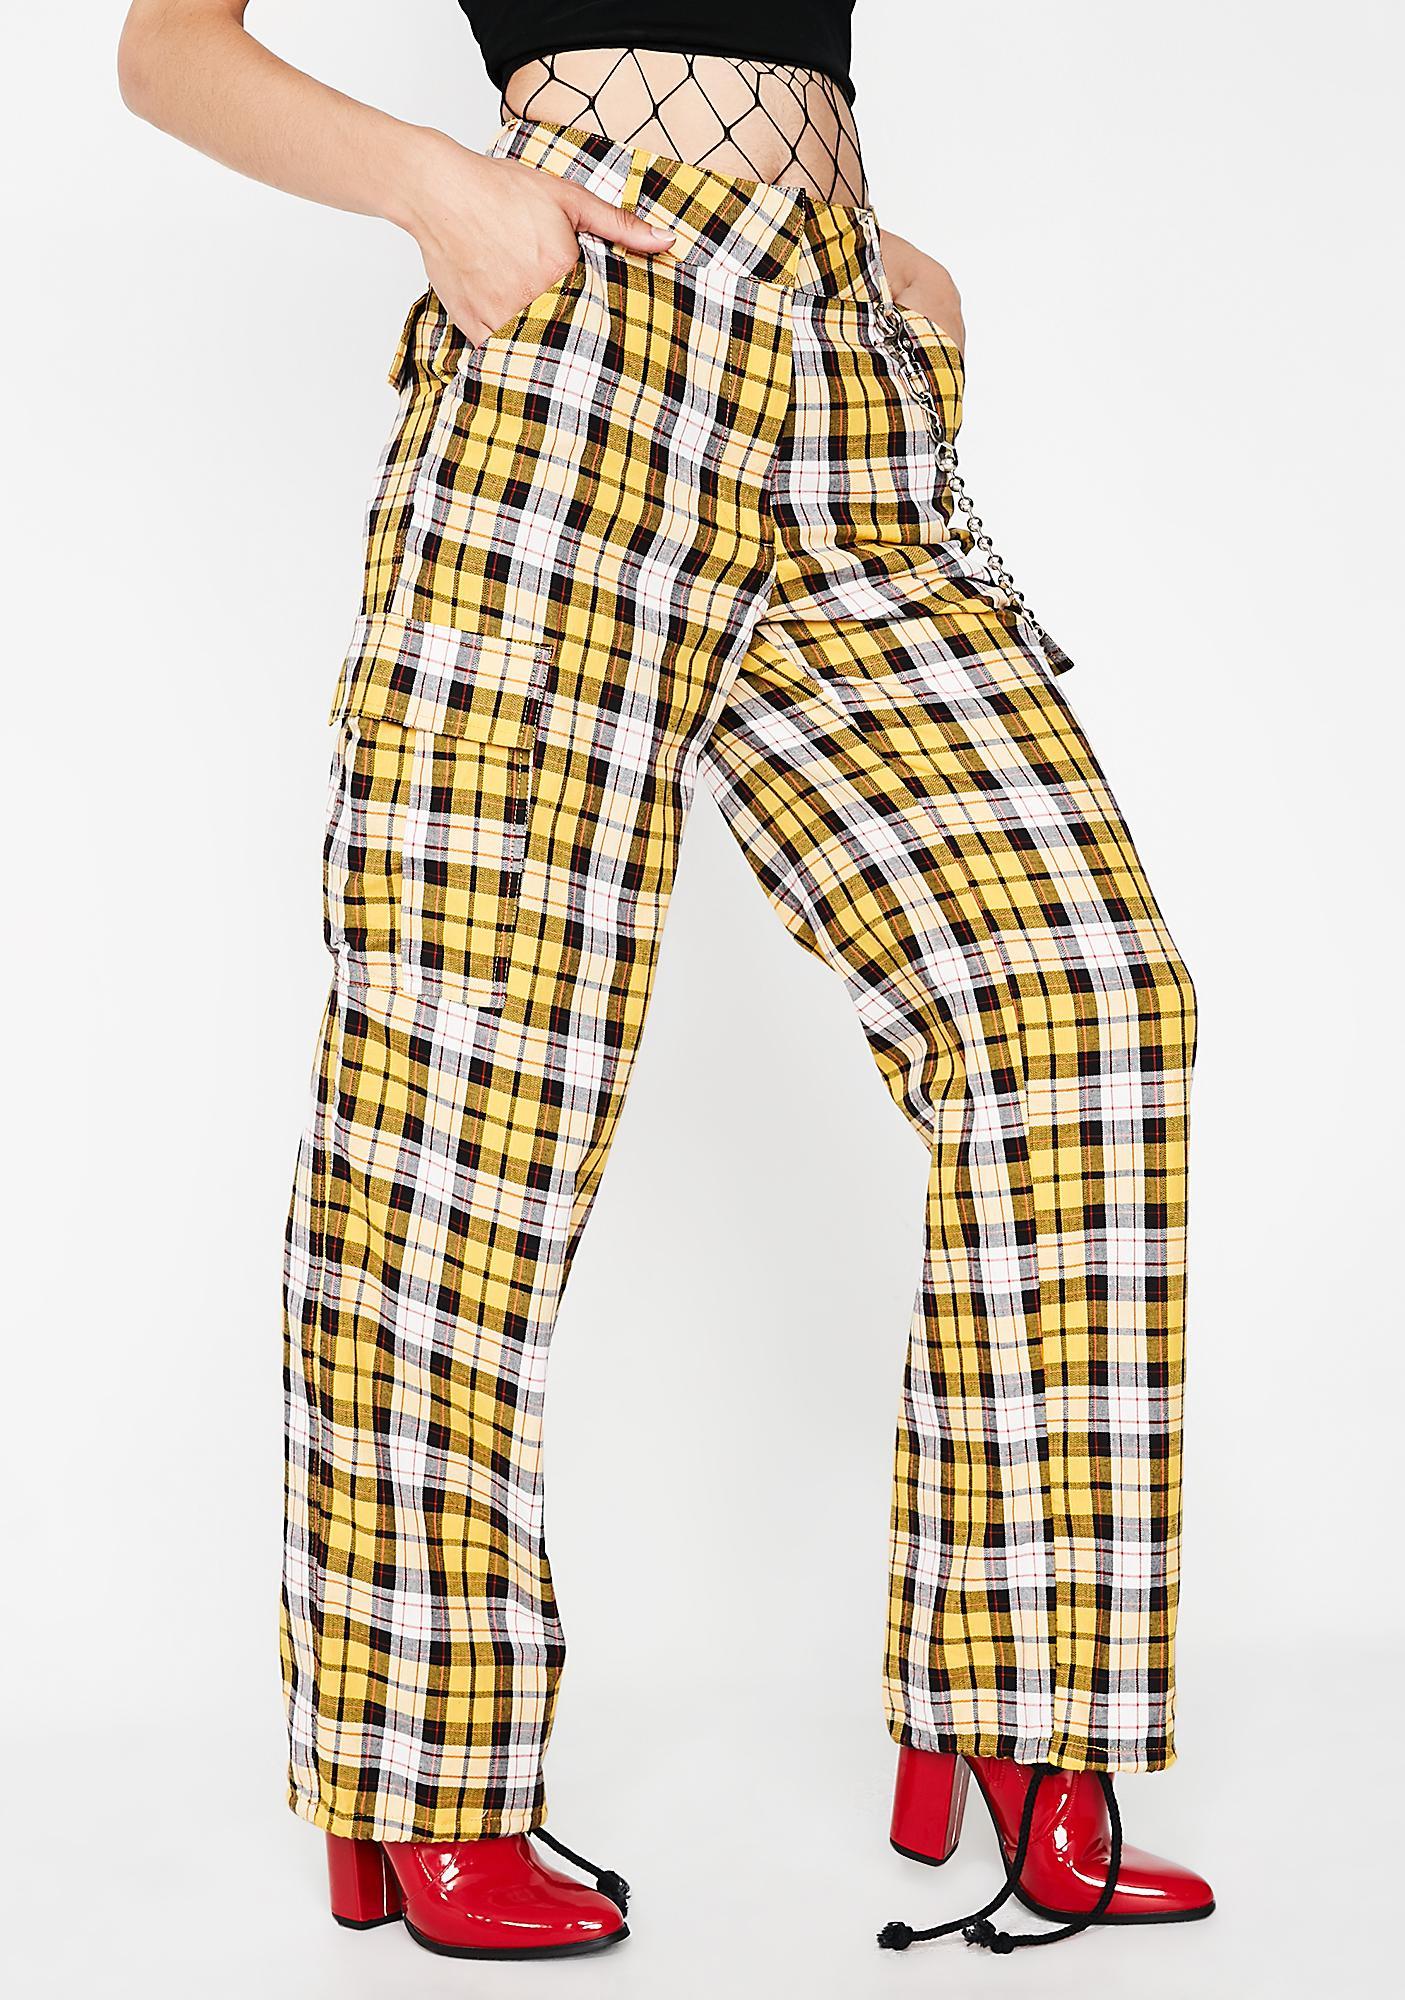 I AM GIA Keidis Pants